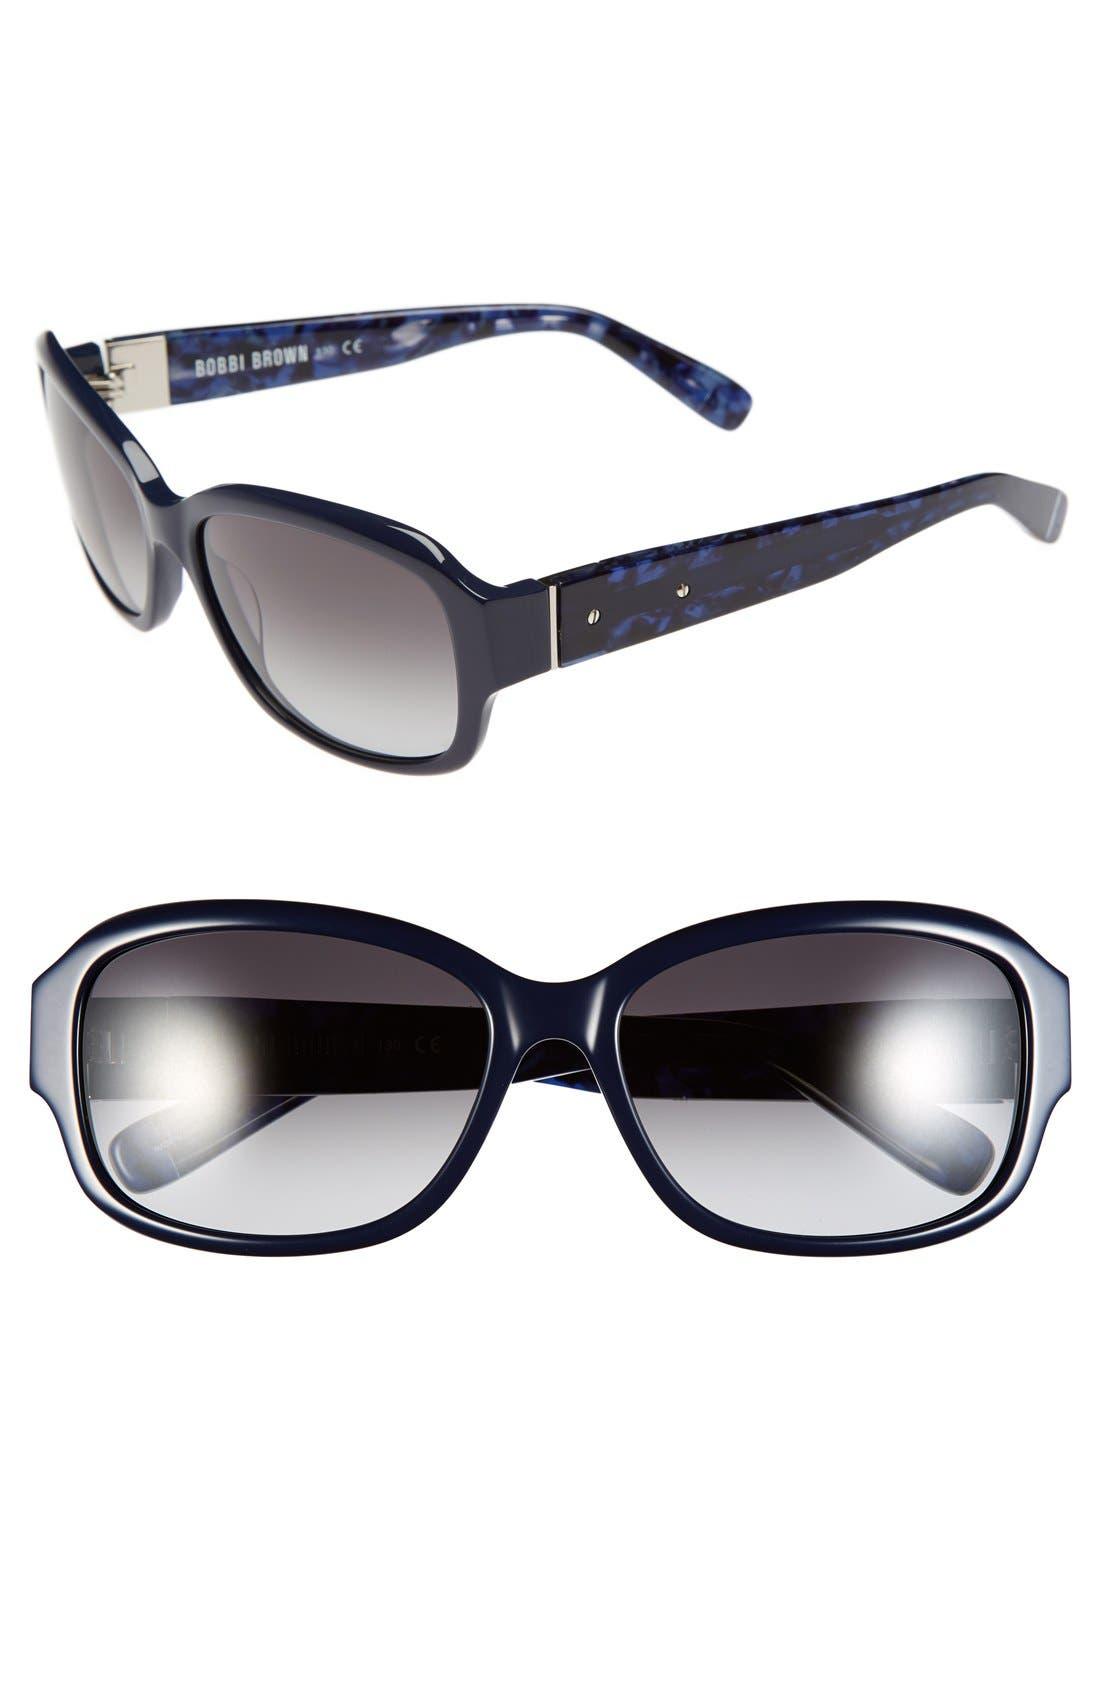 Bobbi Brown 'The Sandra' 57mm Sunglasses